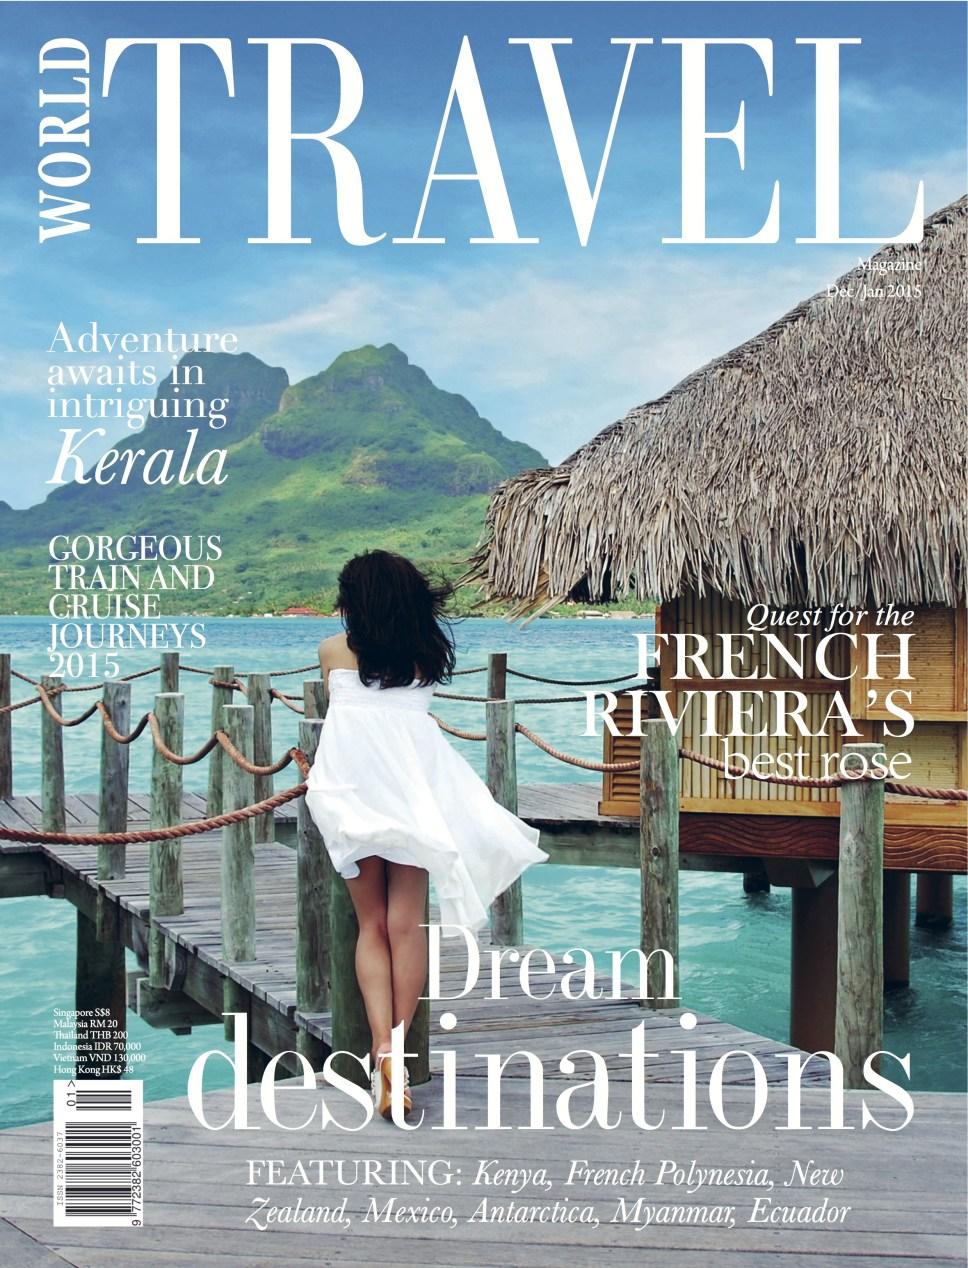 WorldTravelMagazine_Cover_Damon-M-Banks